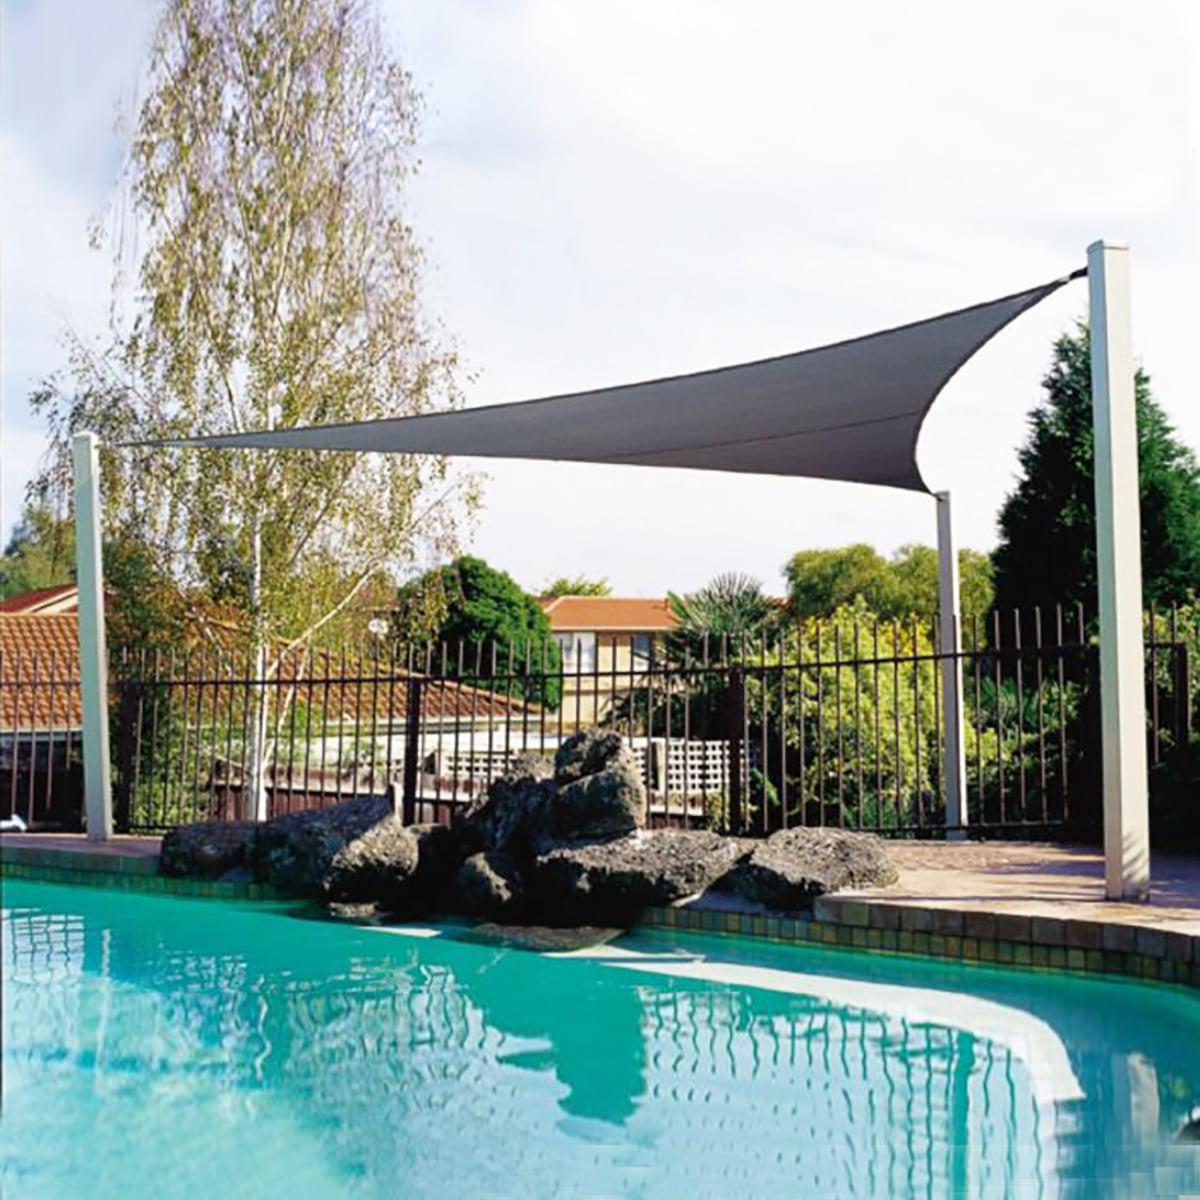 Garden Patio Pool Awning Cover Outdoor Waterproof Sun Shade Sail Canopy Sunshade UV Blocked Beige Fabric Triangle 3.6m/5m